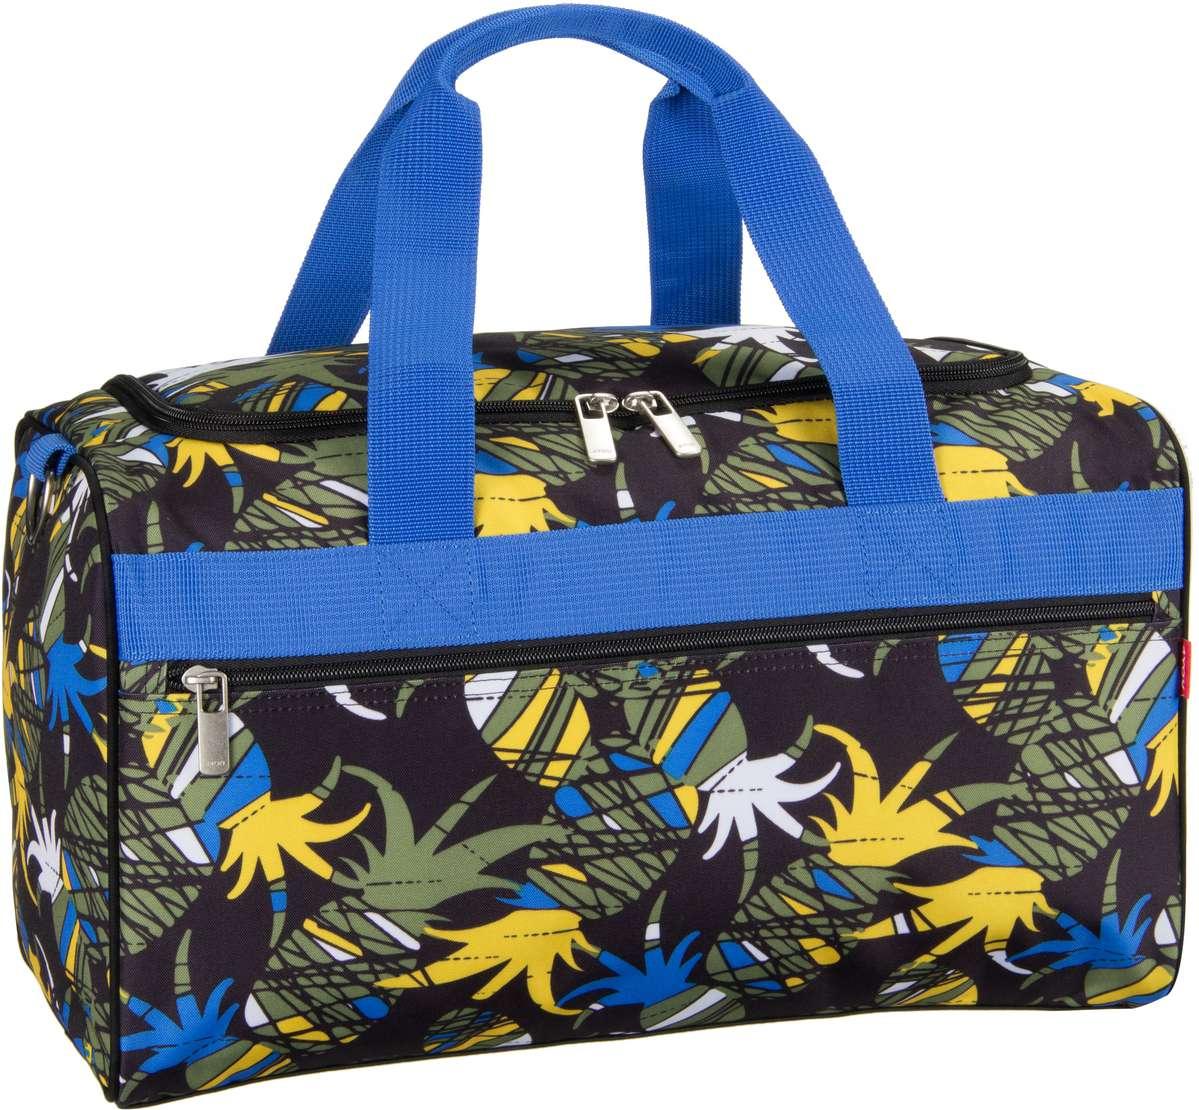 4YOU Sporttasche M Pineapples - Sporttasche